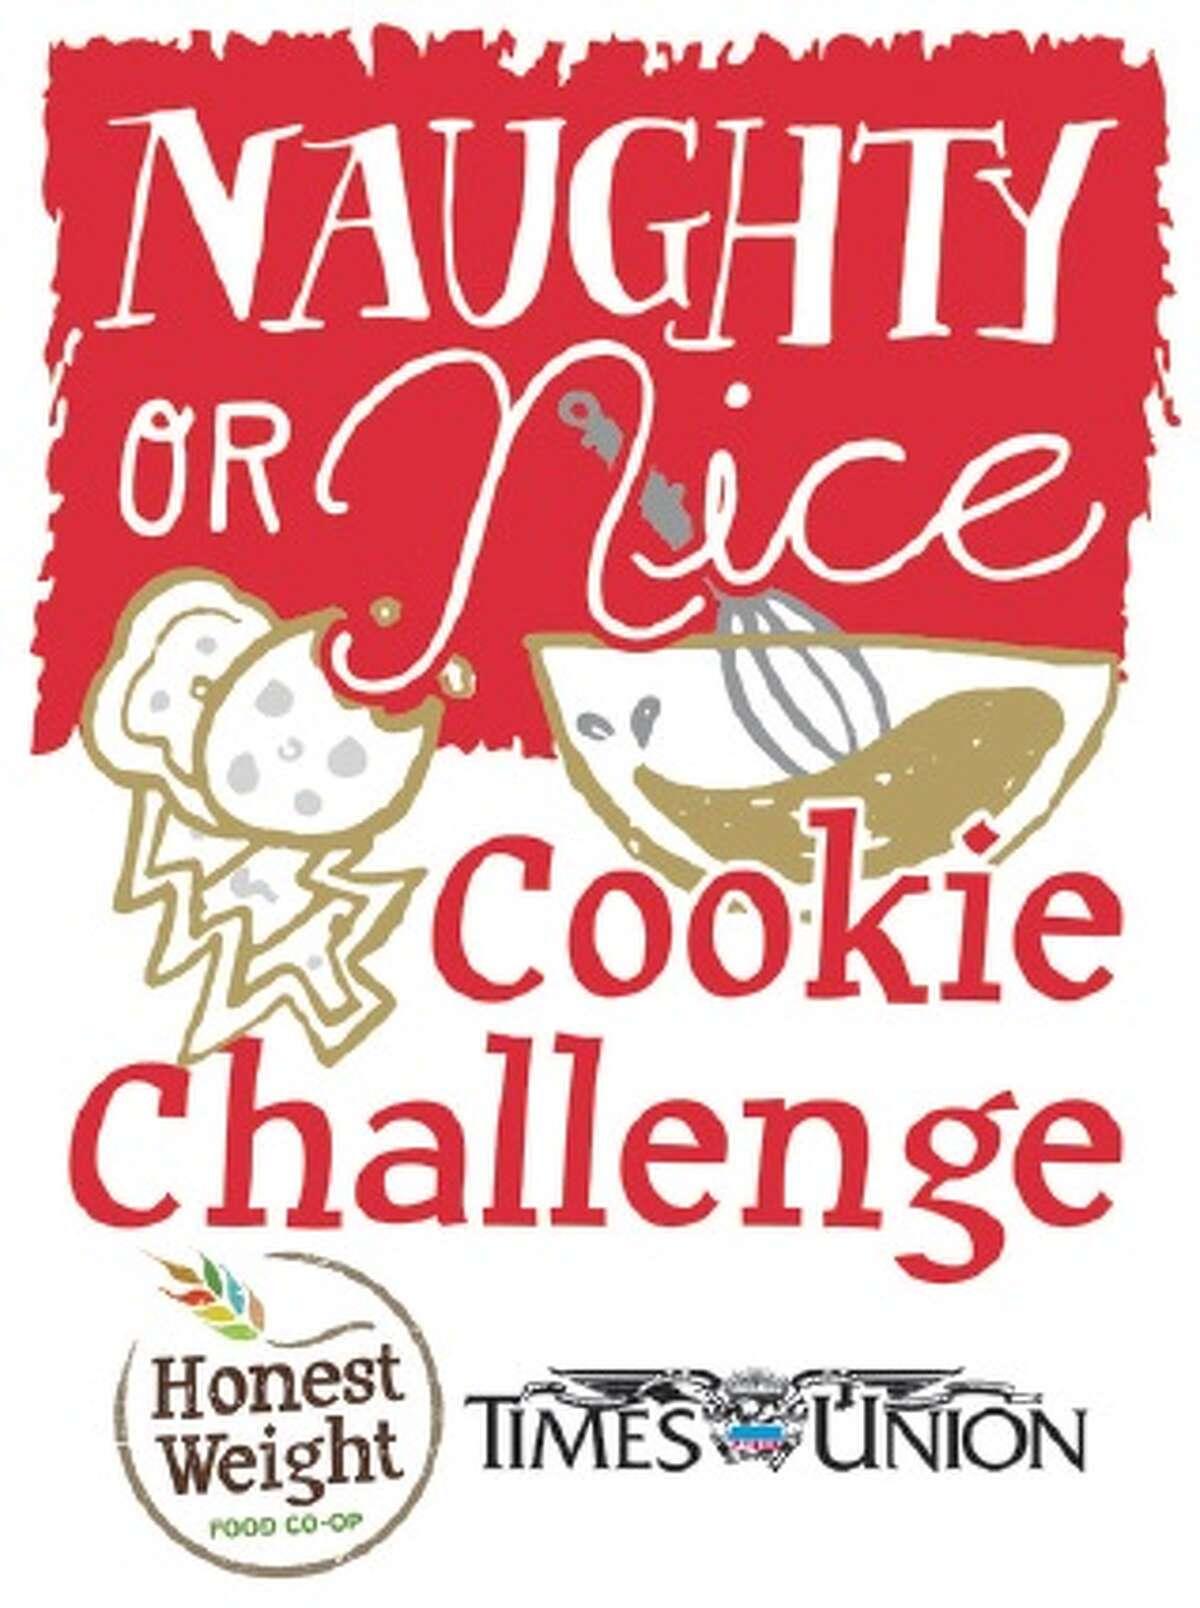 Naughty or Nice Cookie Challenge logo.